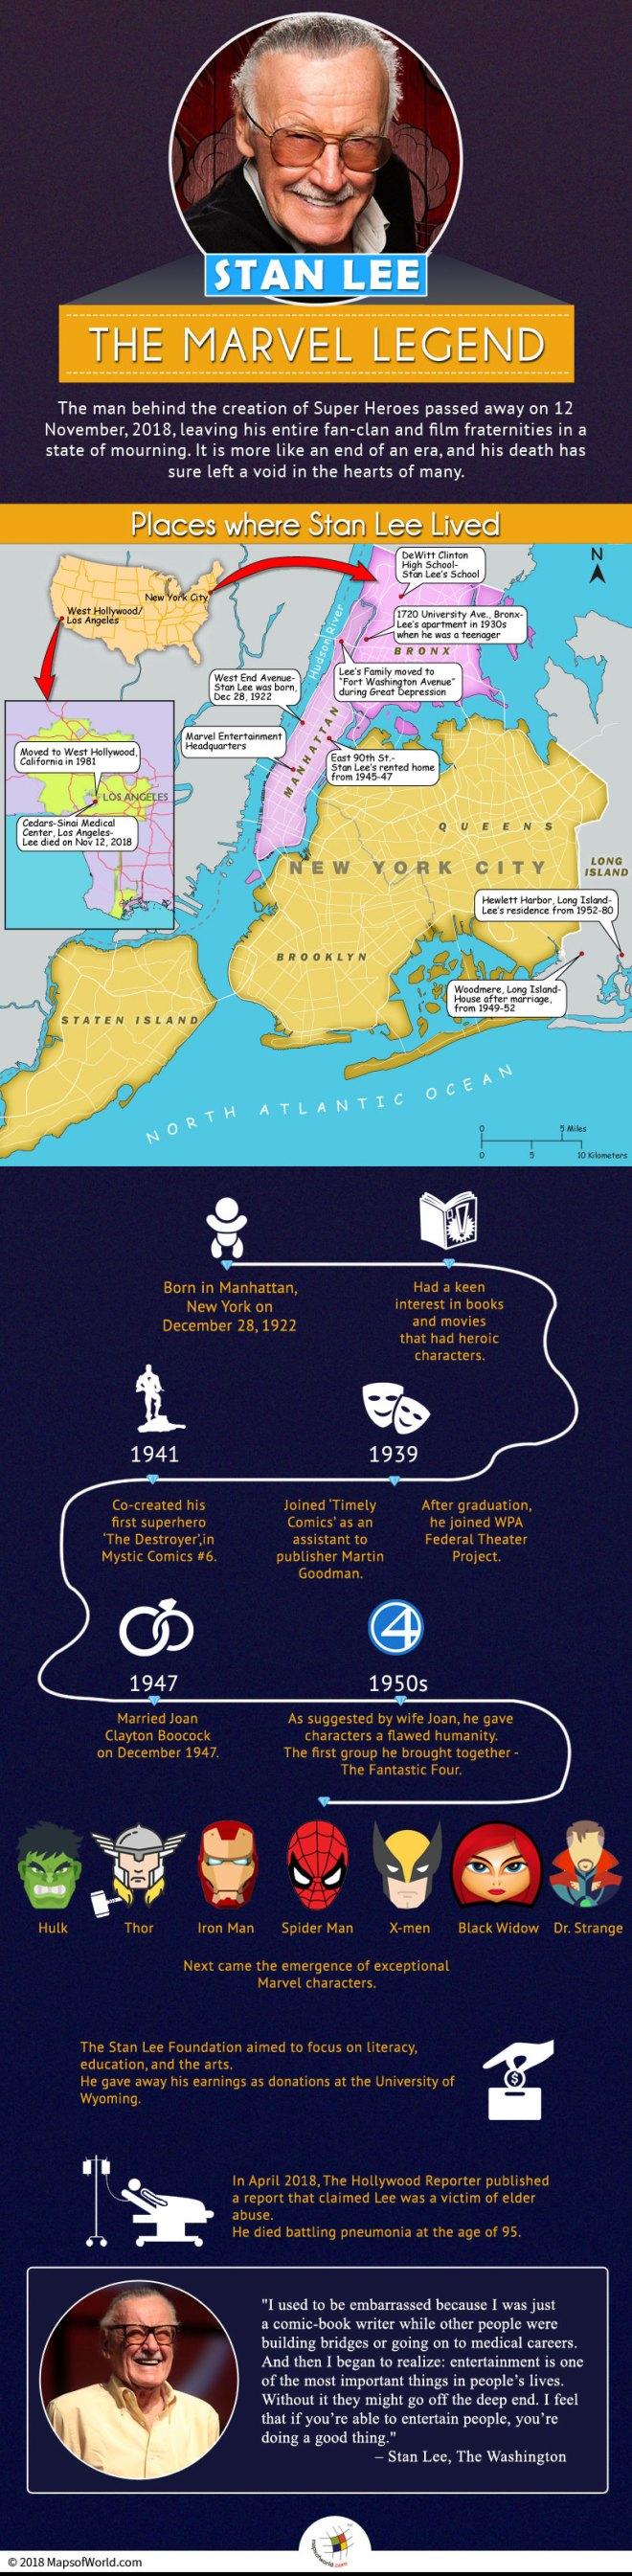 Infographic Elaborating Stan Lee's Life